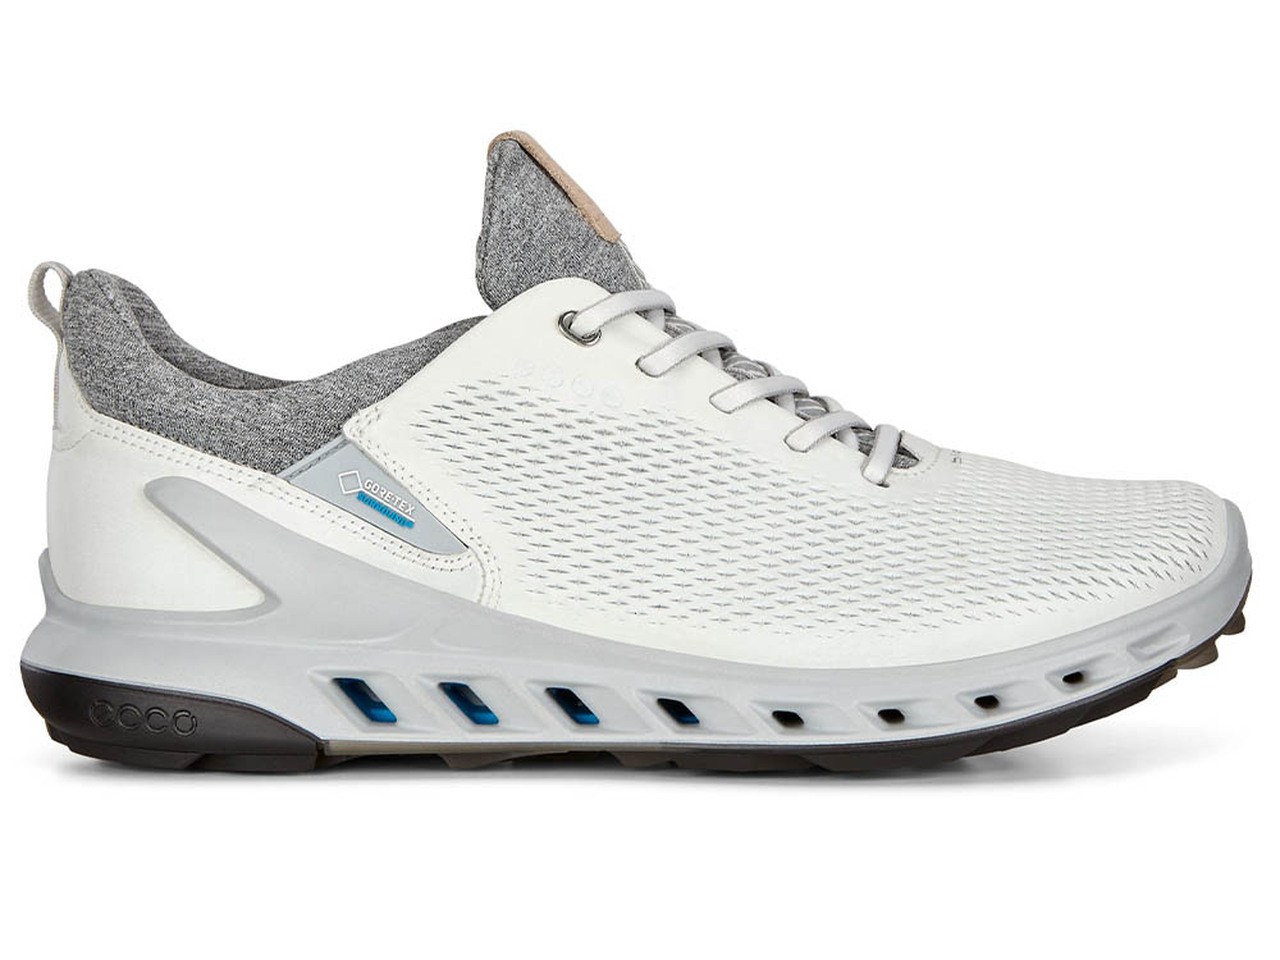 ecco cool pro golf shoes